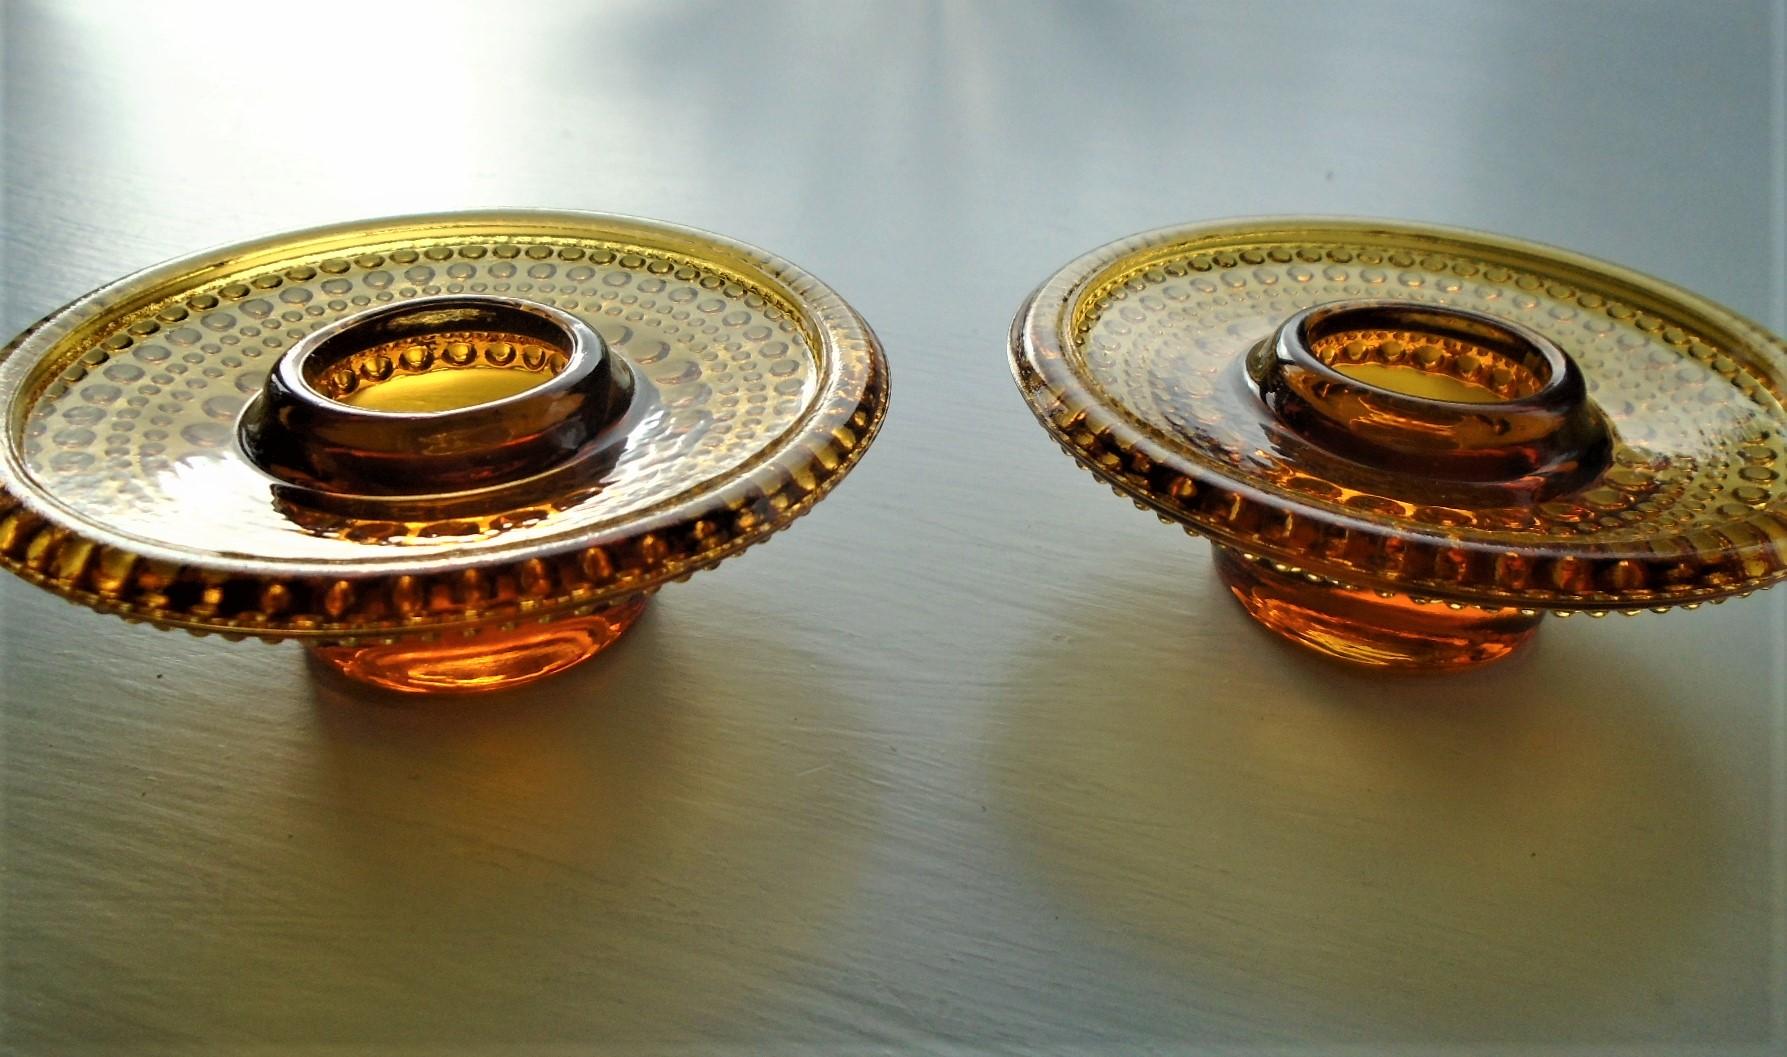 Pair of exquisite vintage amber Iittala Kastehelmi candle holders by Oiva Toikka.